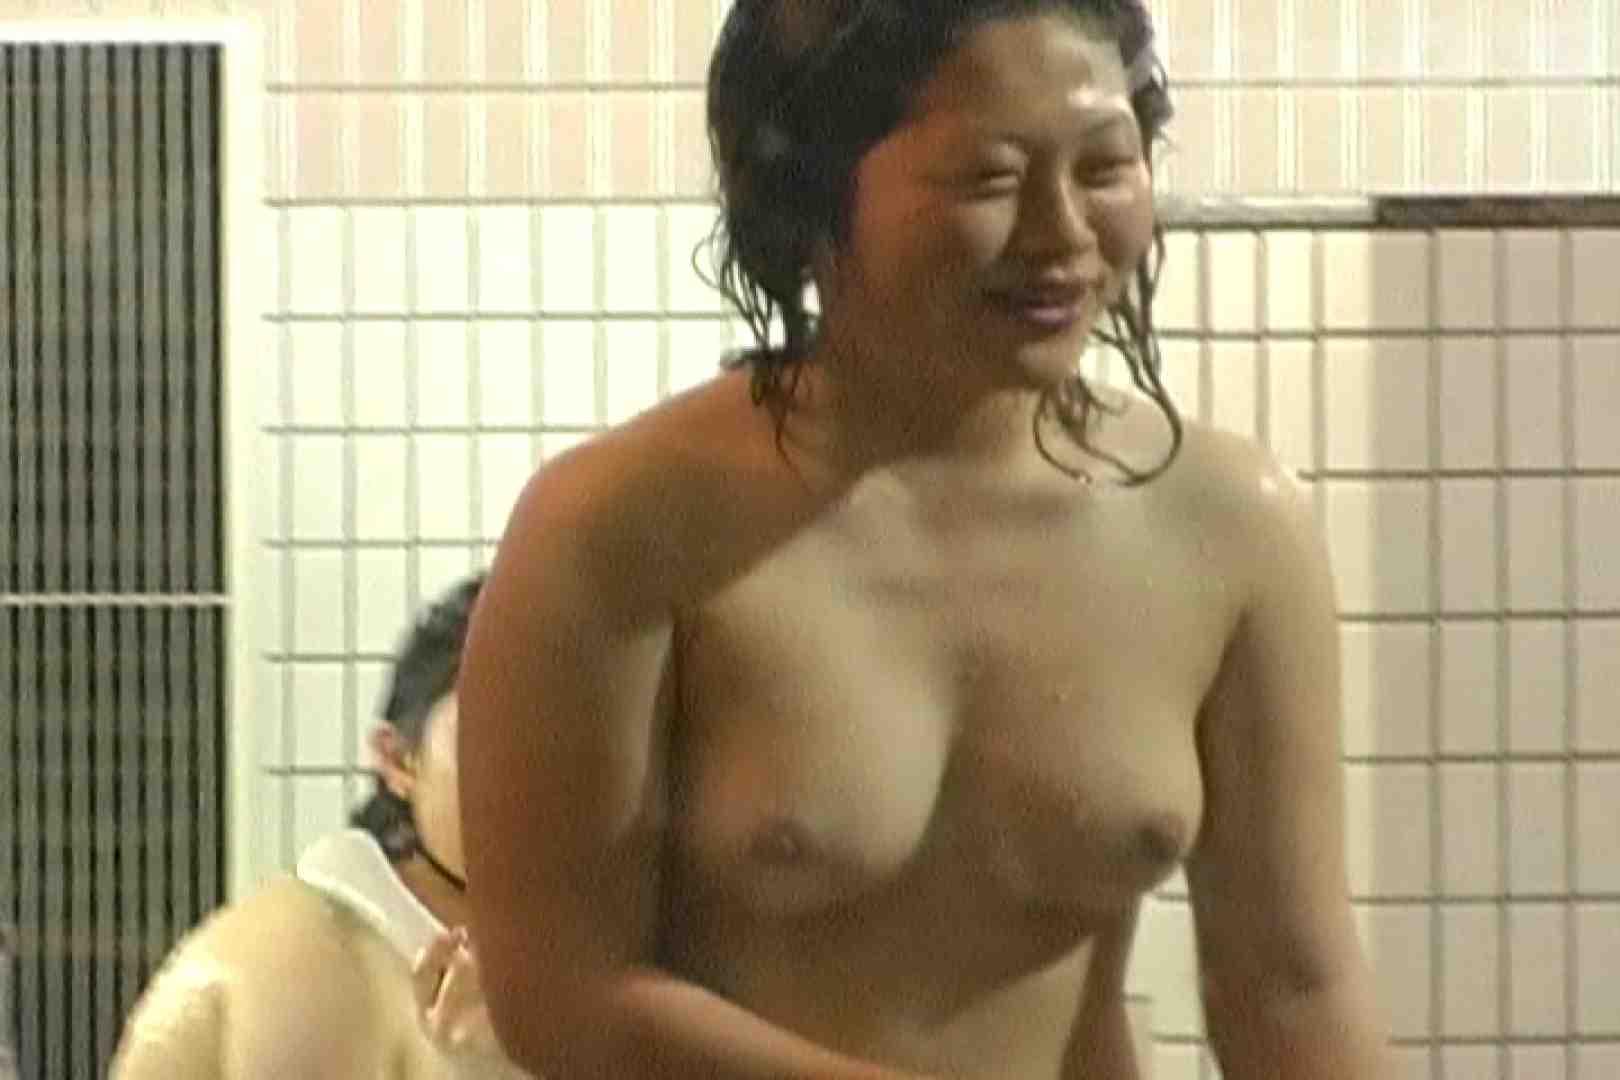 ▲復活限定▲合宿ホテル女風呂盗撮 Vol.27 女風呂 | 盗撮  87pic 79